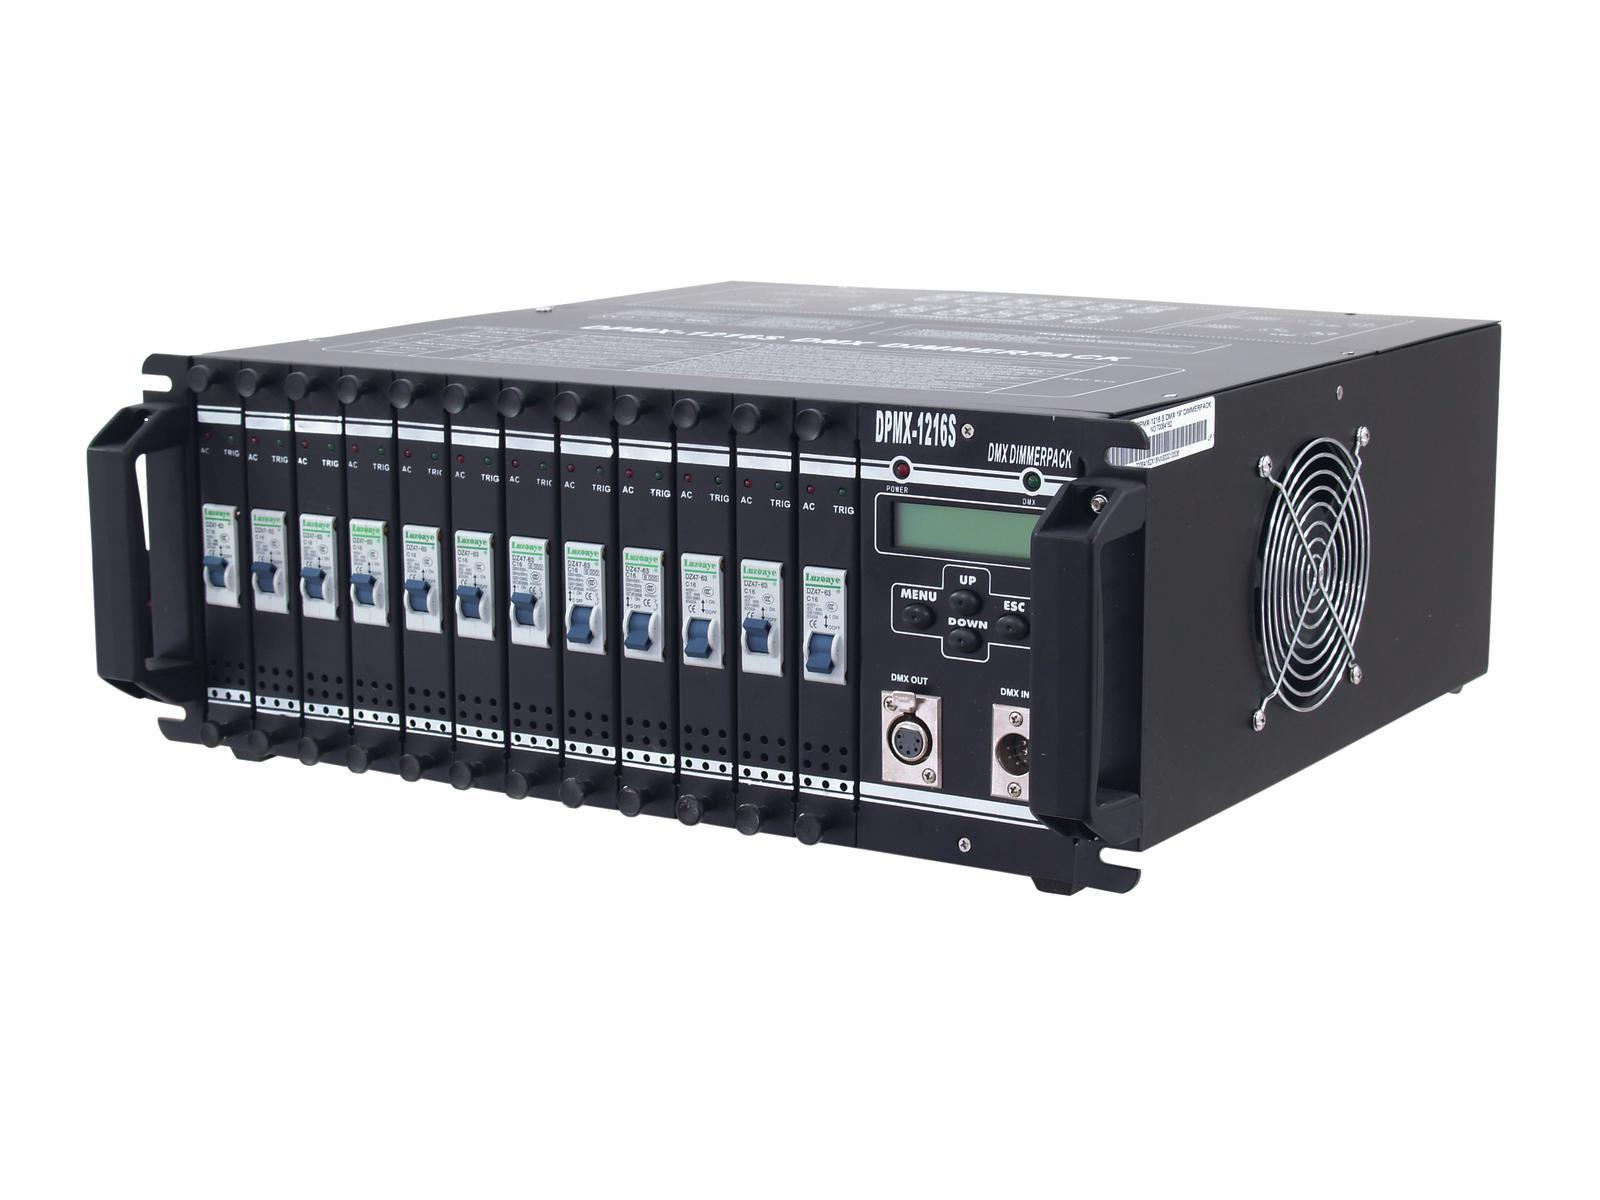 EUROLITE DPMX-1216 S DMX Dimmerpack